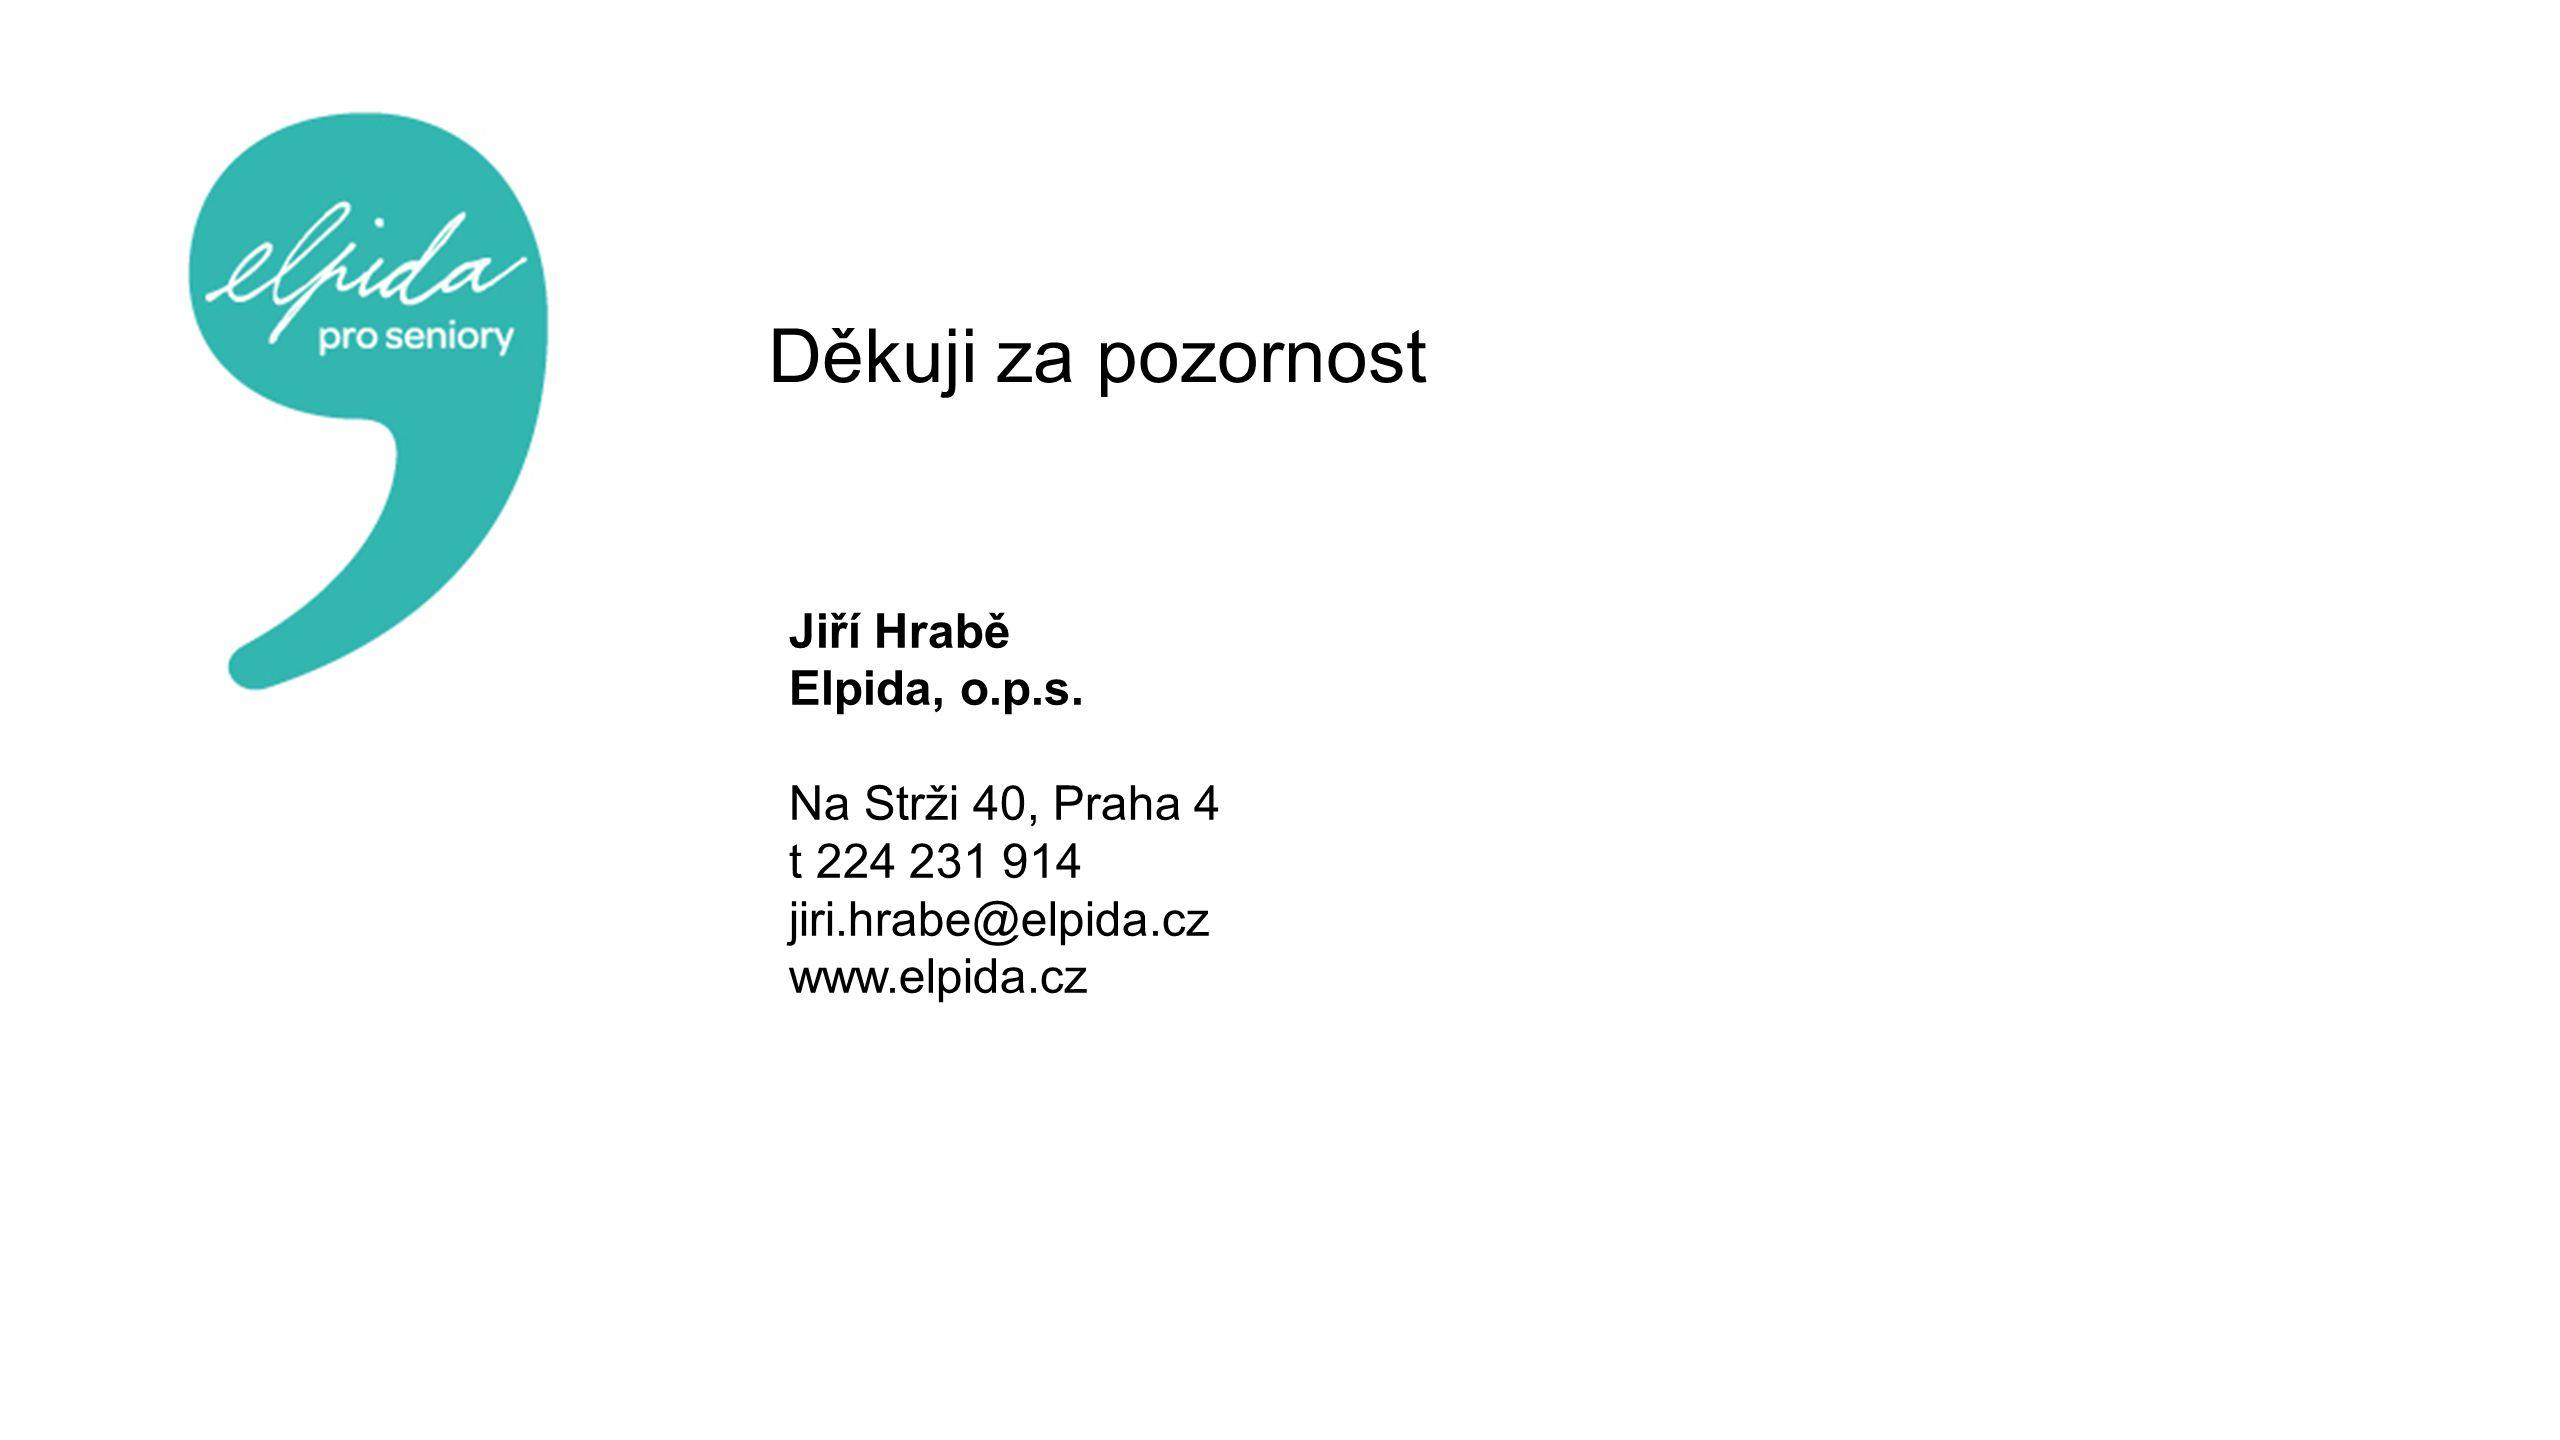 Jiří Hrabě Elpida, o.p.s.